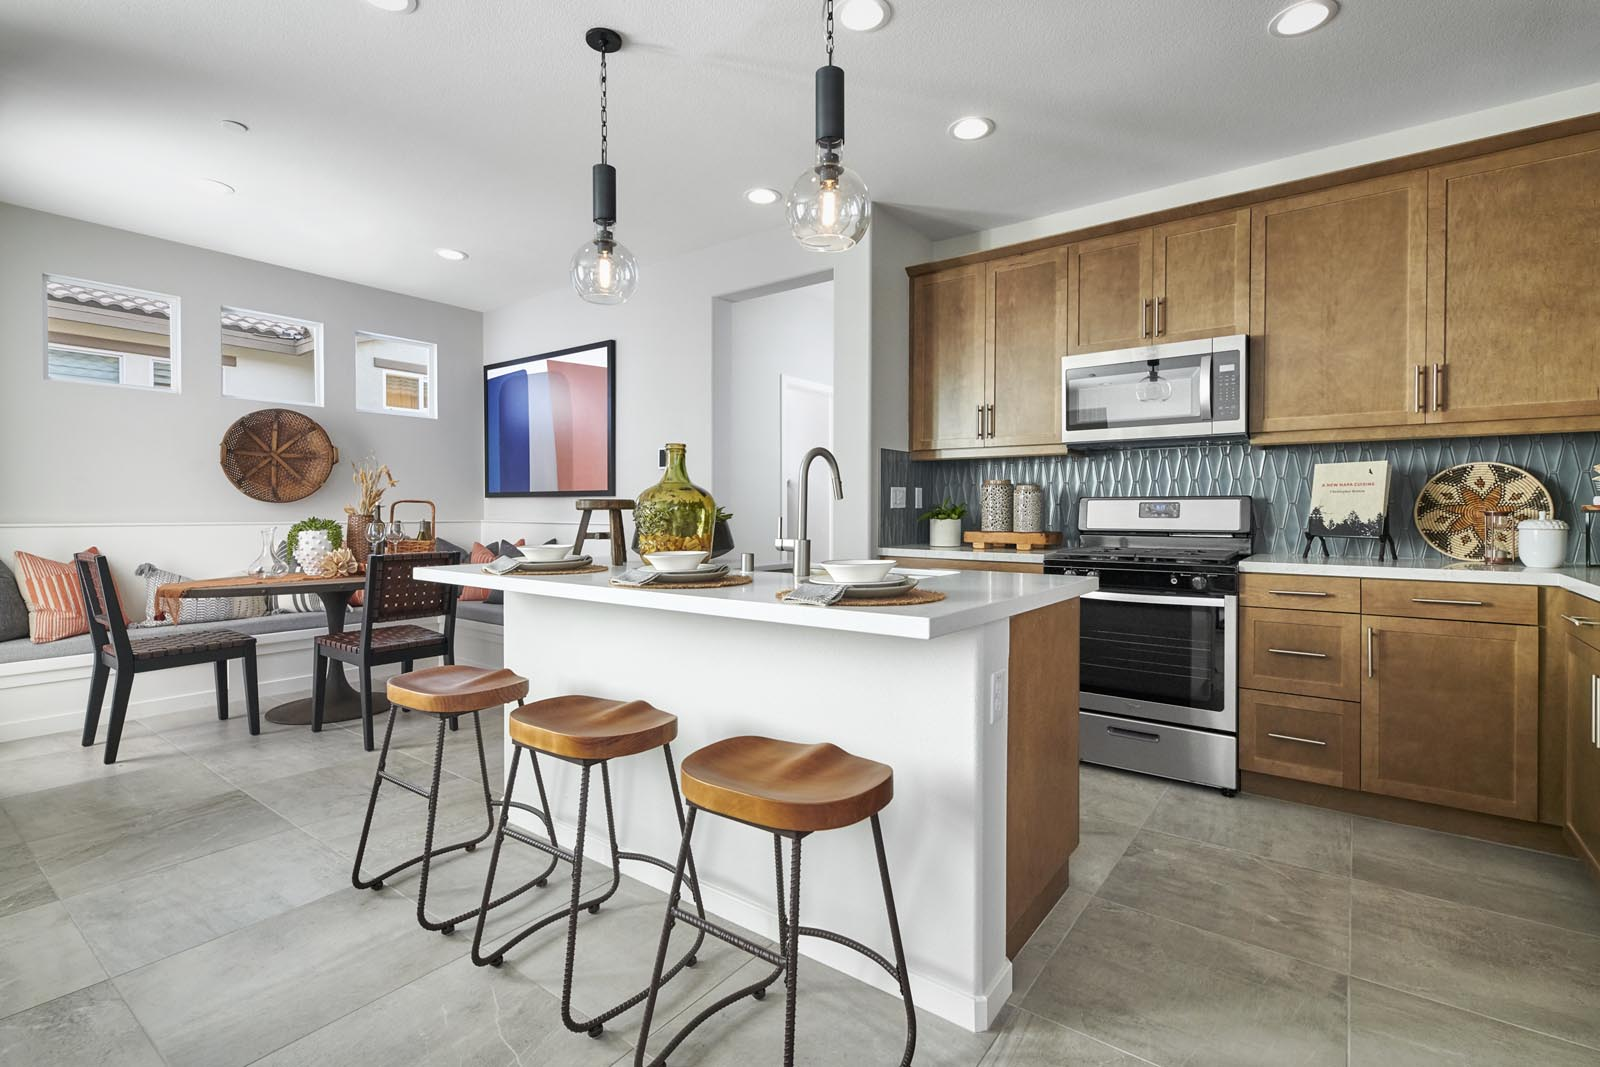 Kitchen | Residence 1 | Lumin | New Homes in Rancho Cucamonga, CA | Van Daele Homes